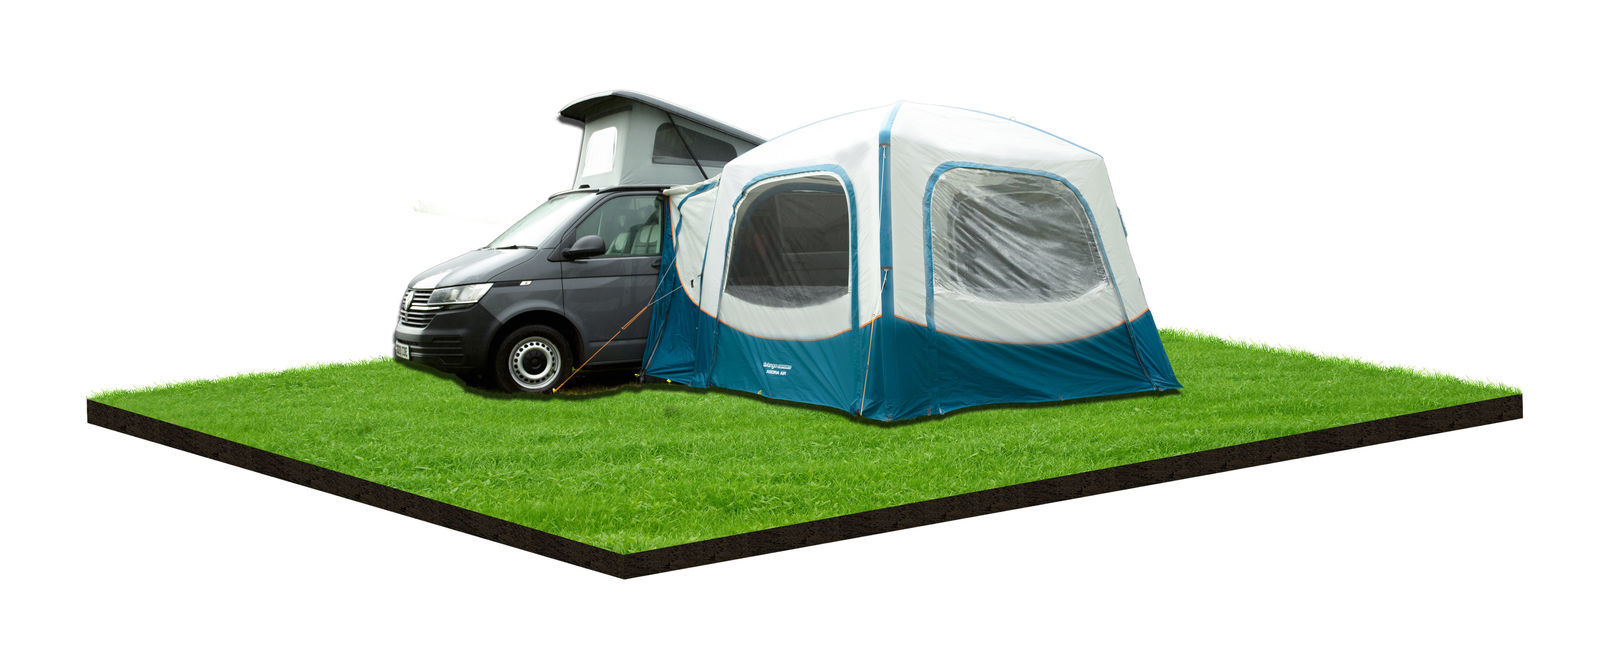 Vango Agora Driveaway 2021 Norwich Camping 5